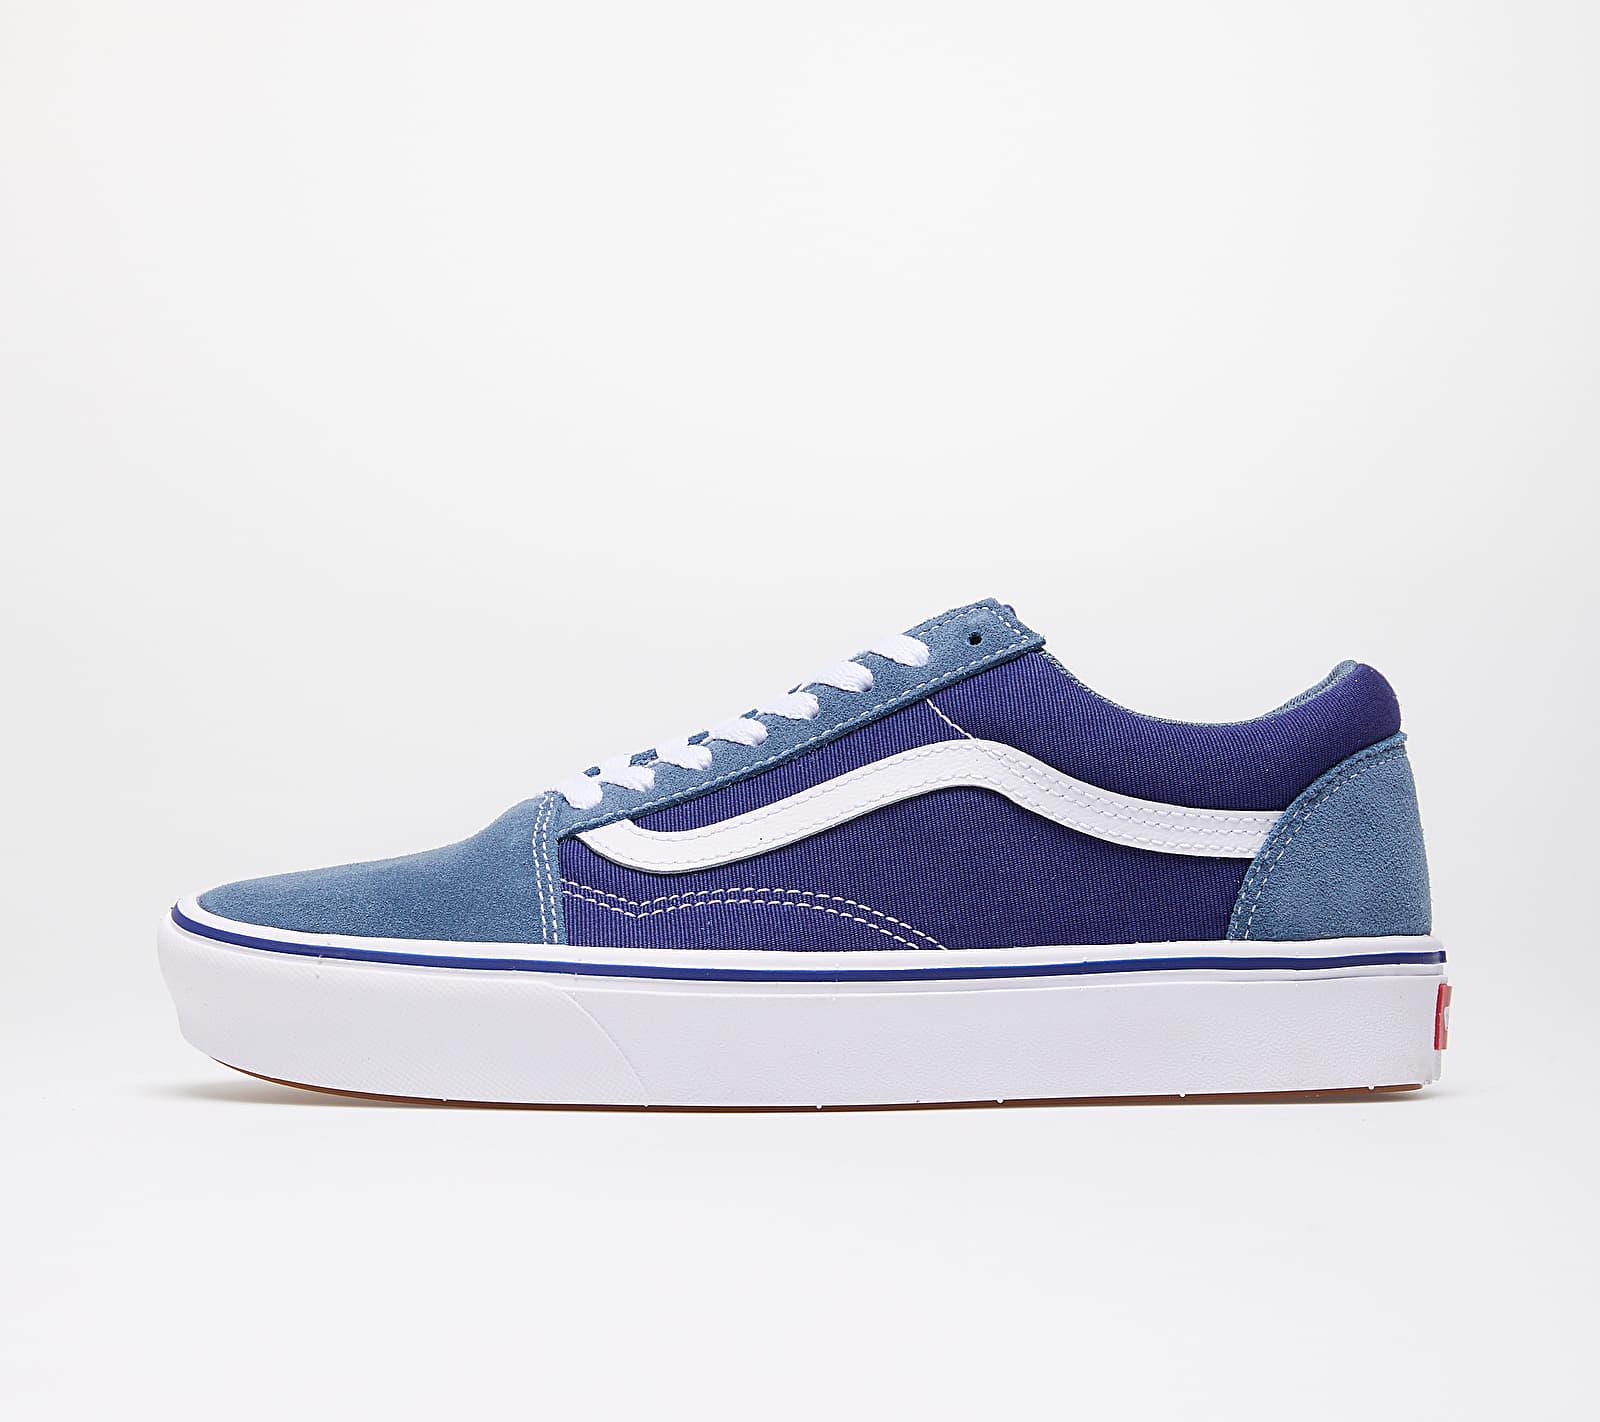 Vans ComfyCush Old Skool (Suede/ Textile) Denim/ Blue VN0A3WMAWX01